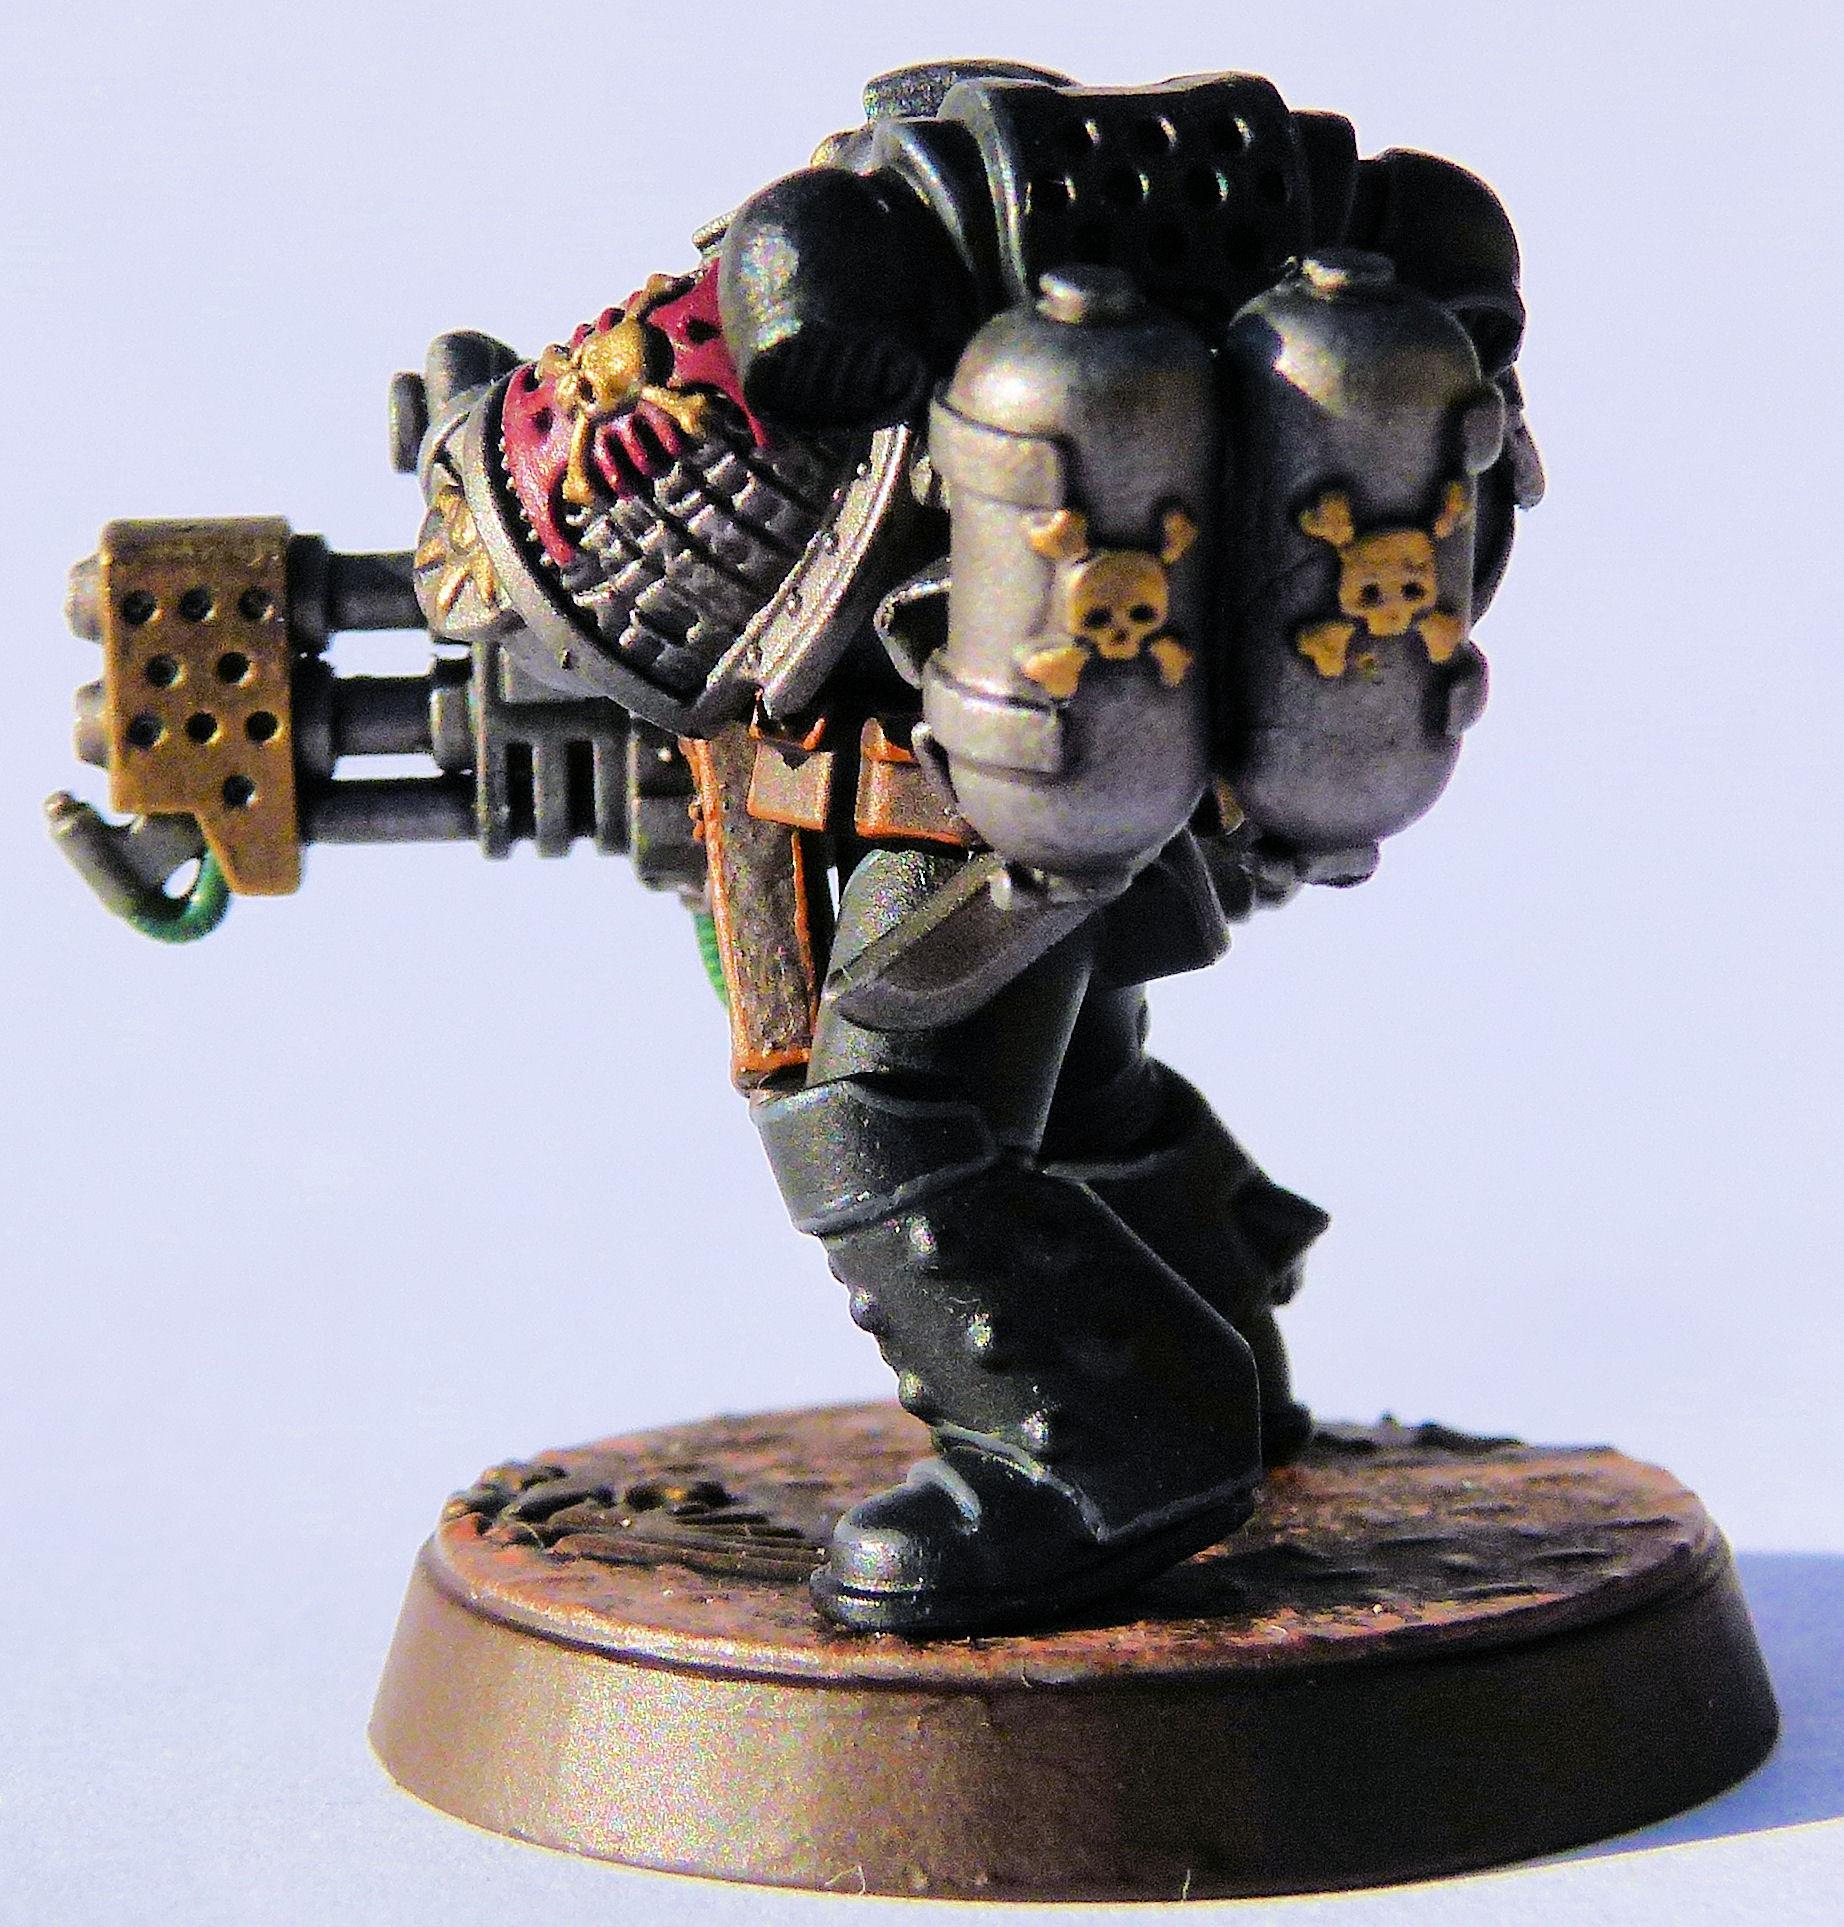 Iron Lords Deathwatch Veteran Rear